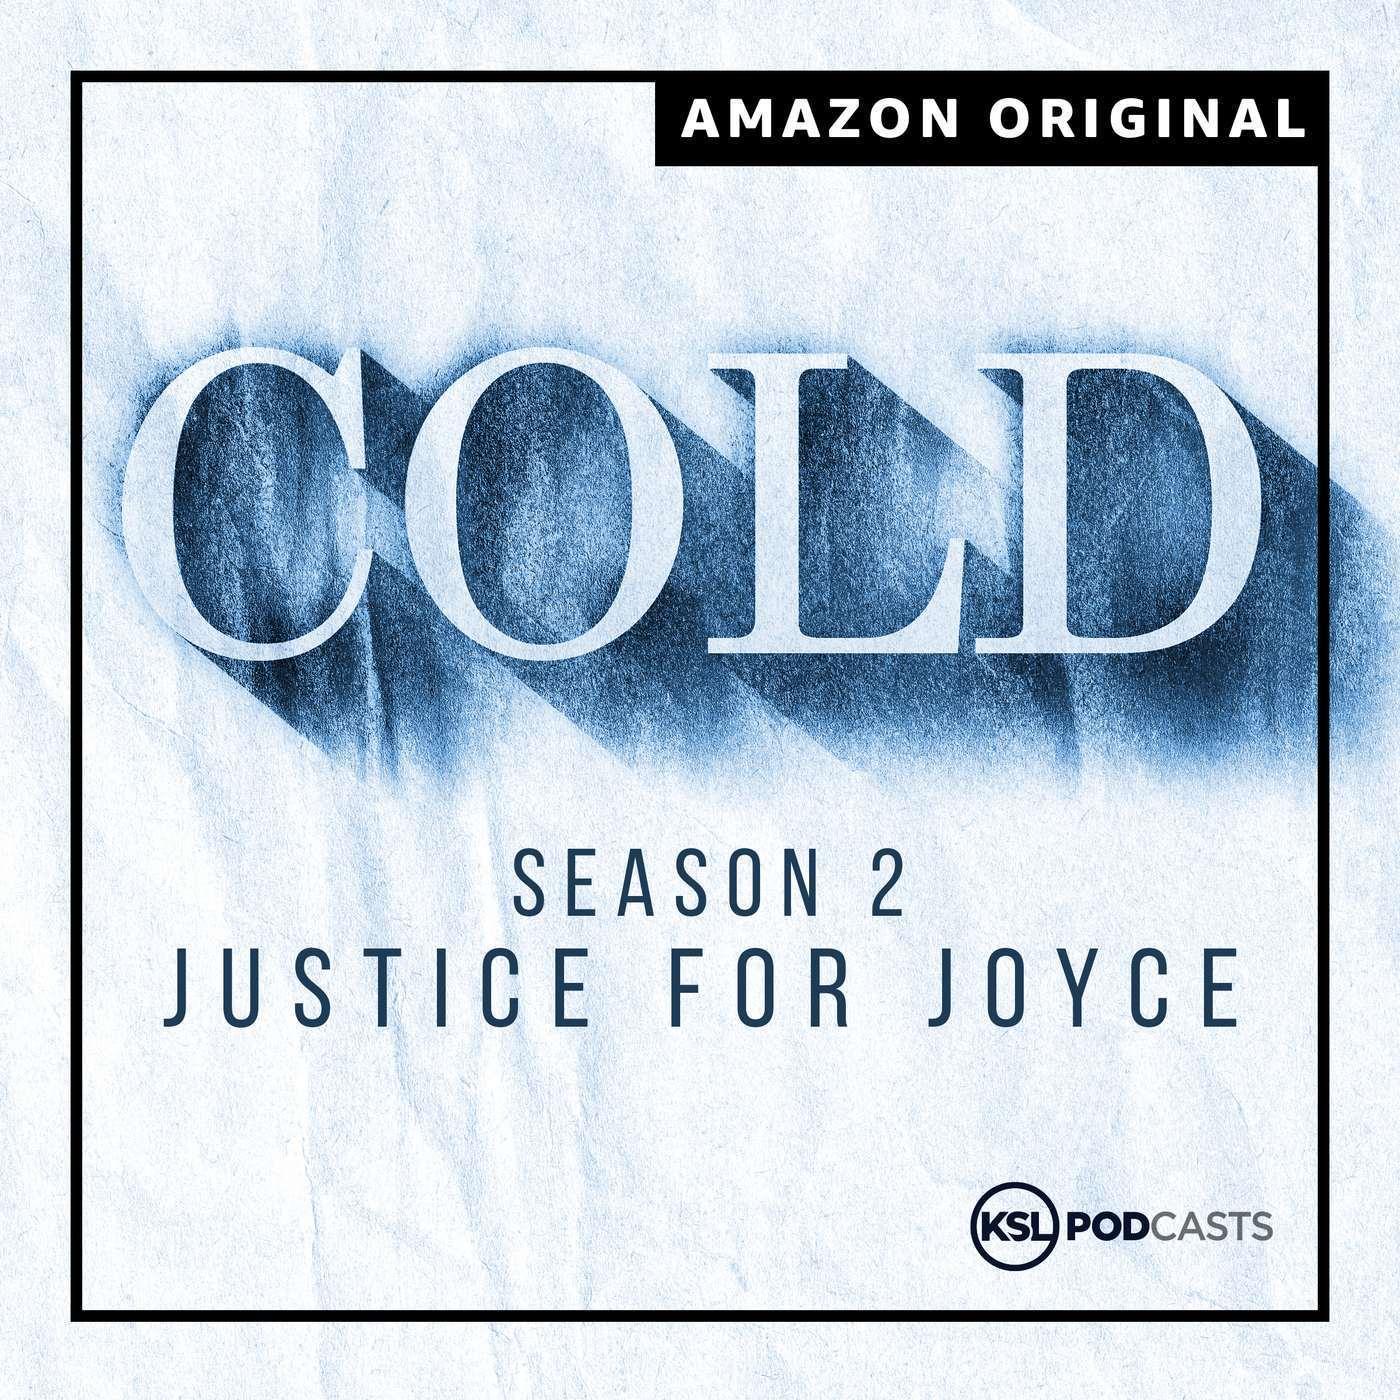 Cold season 2: Justice for Joyce Yost